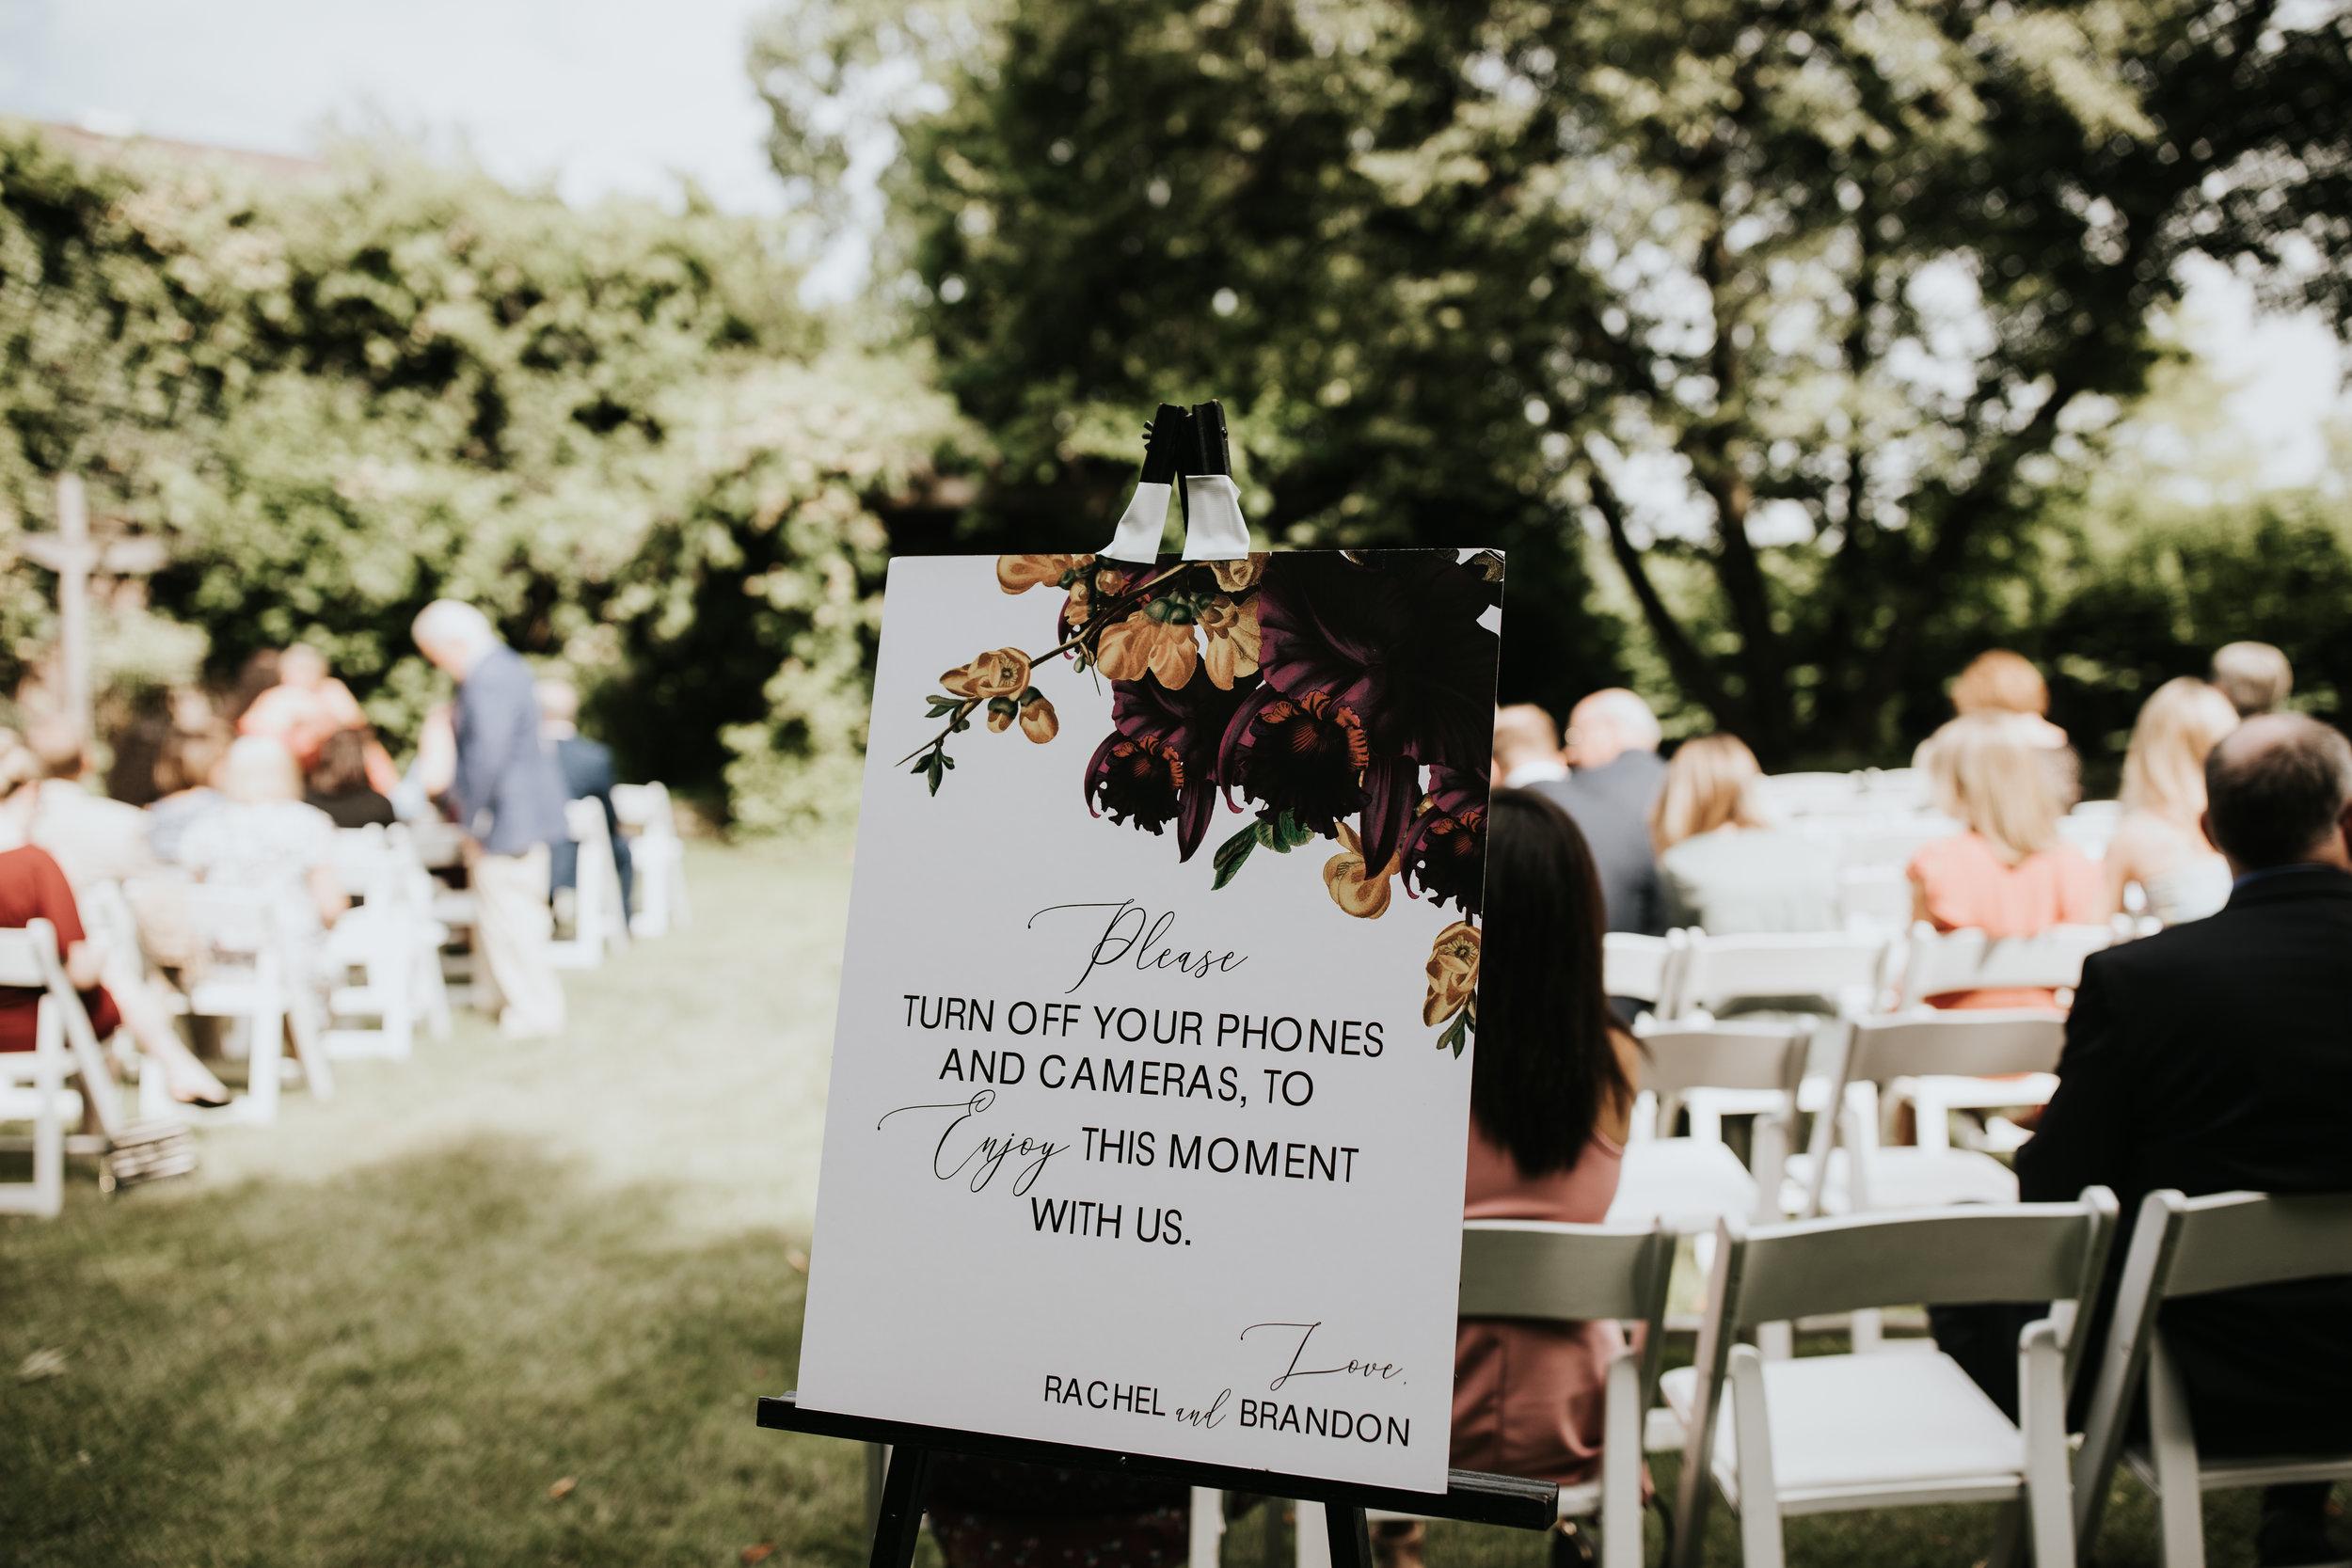 K-Flowers-Designs-Wedding-Signage.jpg